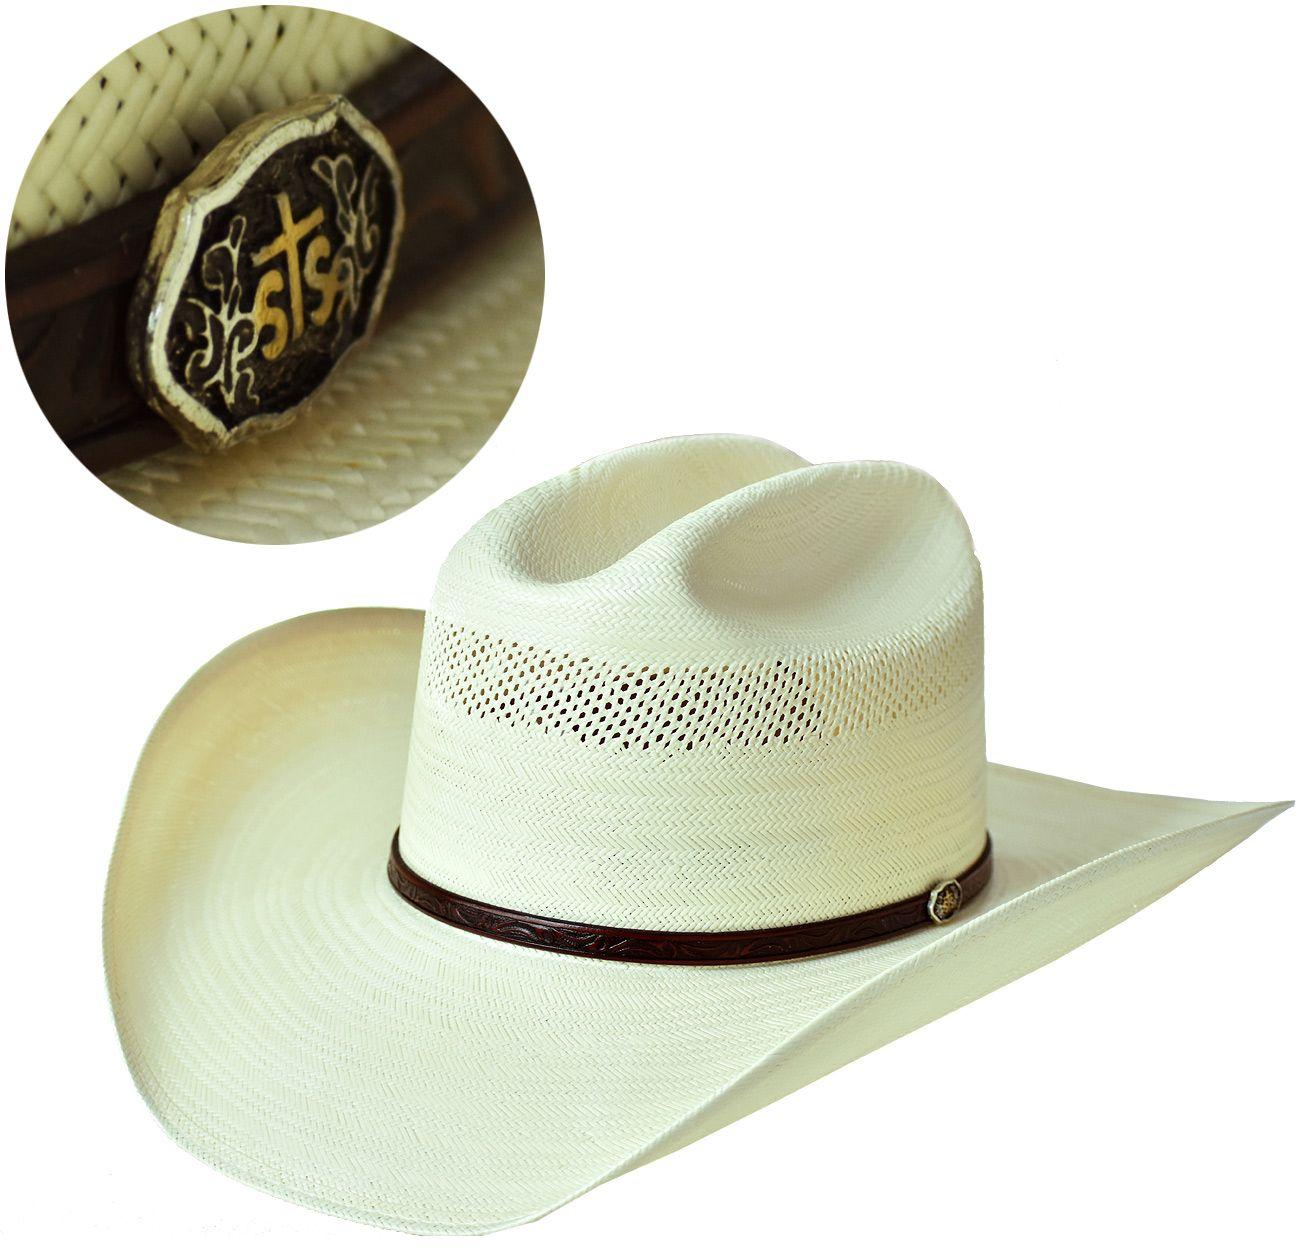 Chapéu de Palha 10X Resistol Cross Tie Chapéu Resistol feito em palha fina de836854ae7